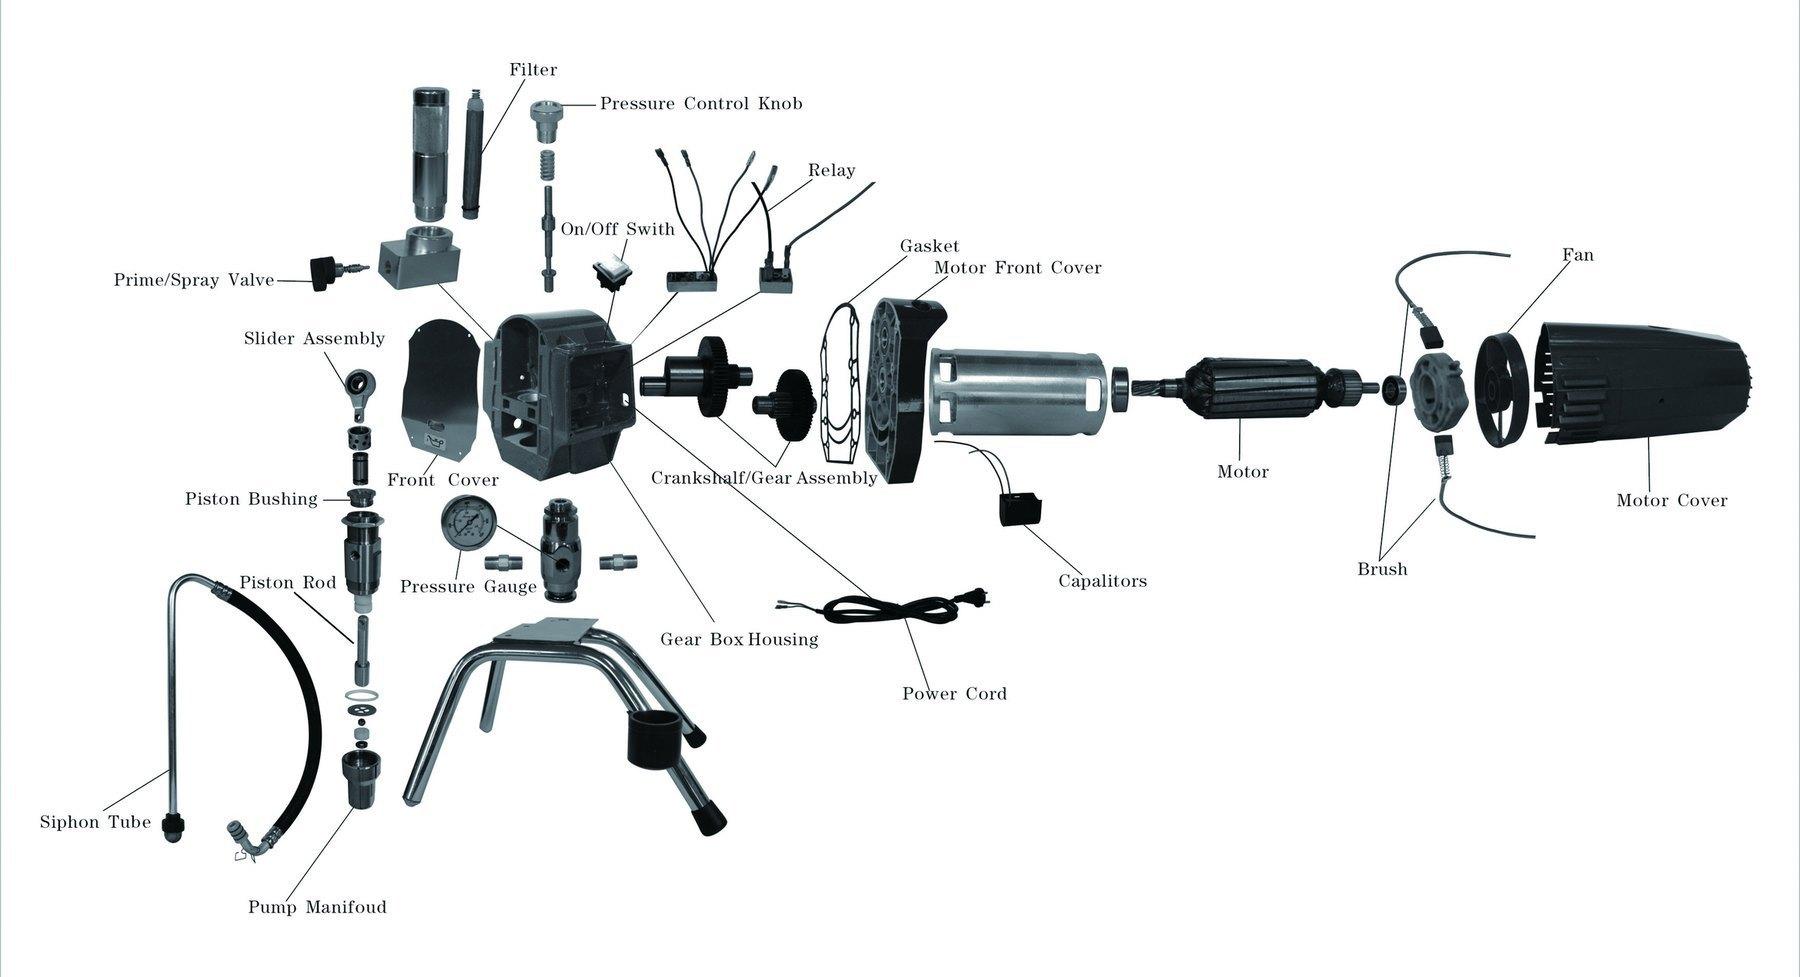 Airless sprayer,electric airless sprayer (piston pump